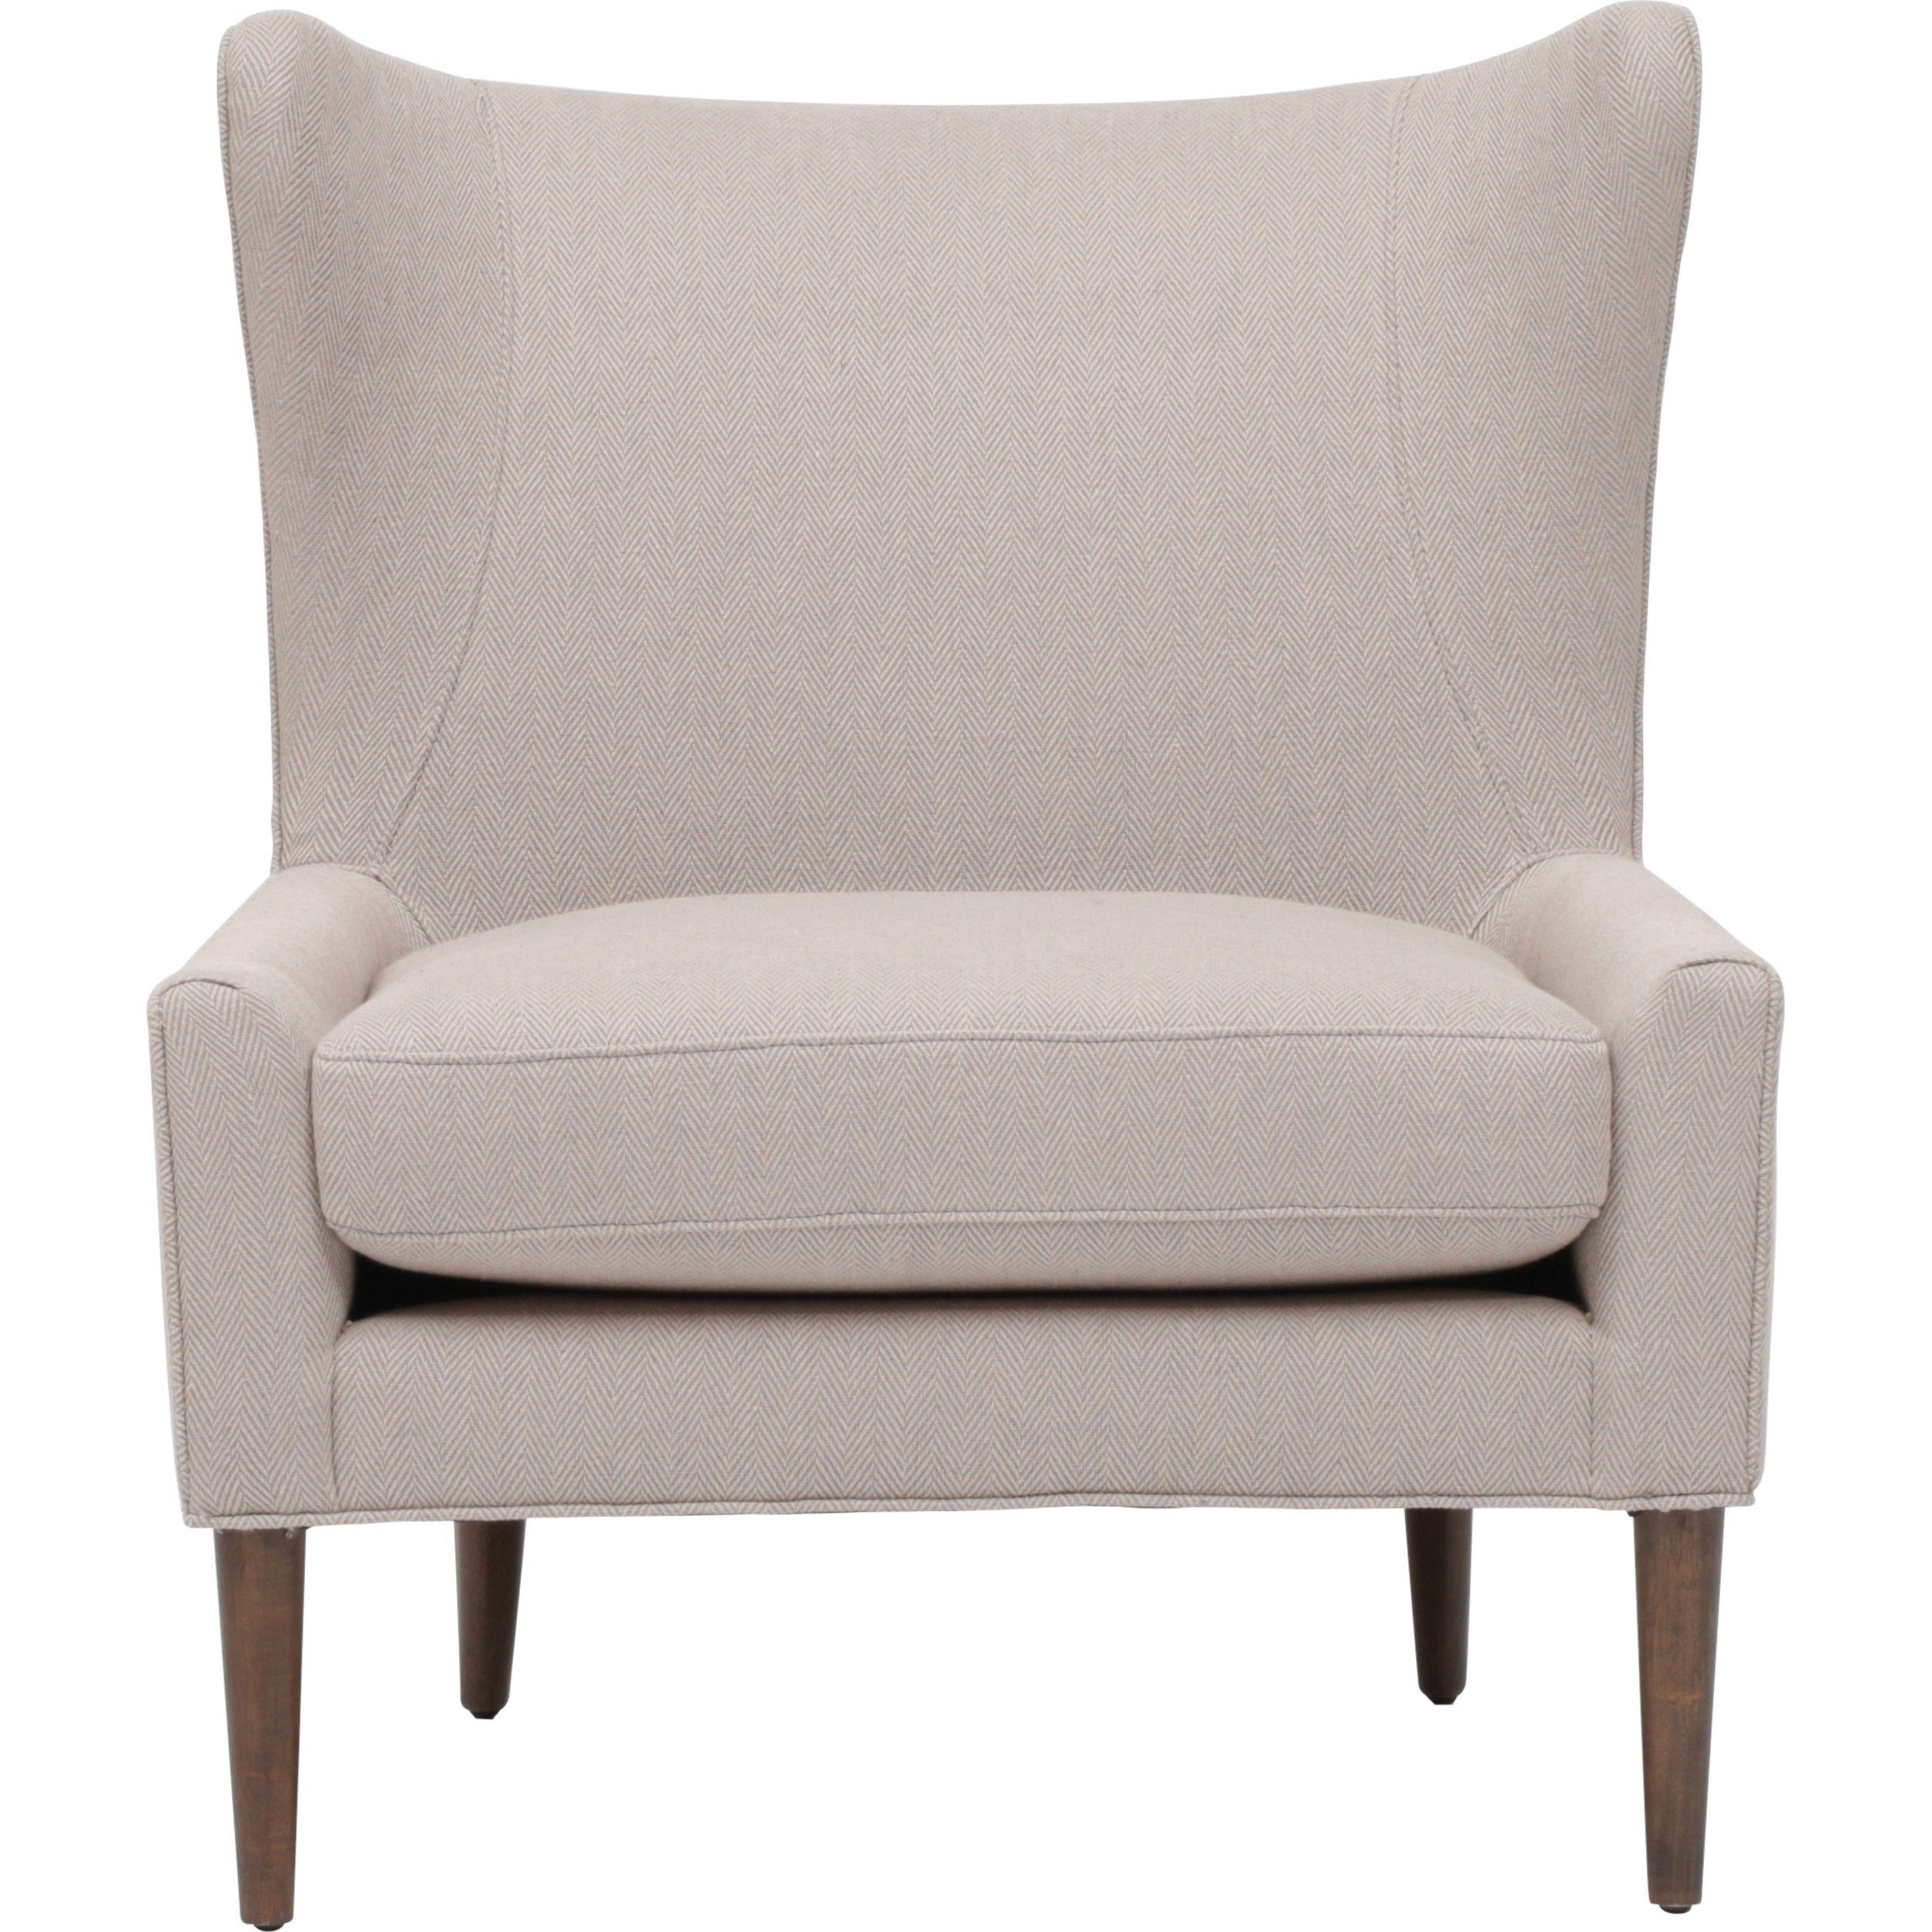 Chevron wing chairs - Marlow Wing Chair Grey Chevron Flash Sale Furniture